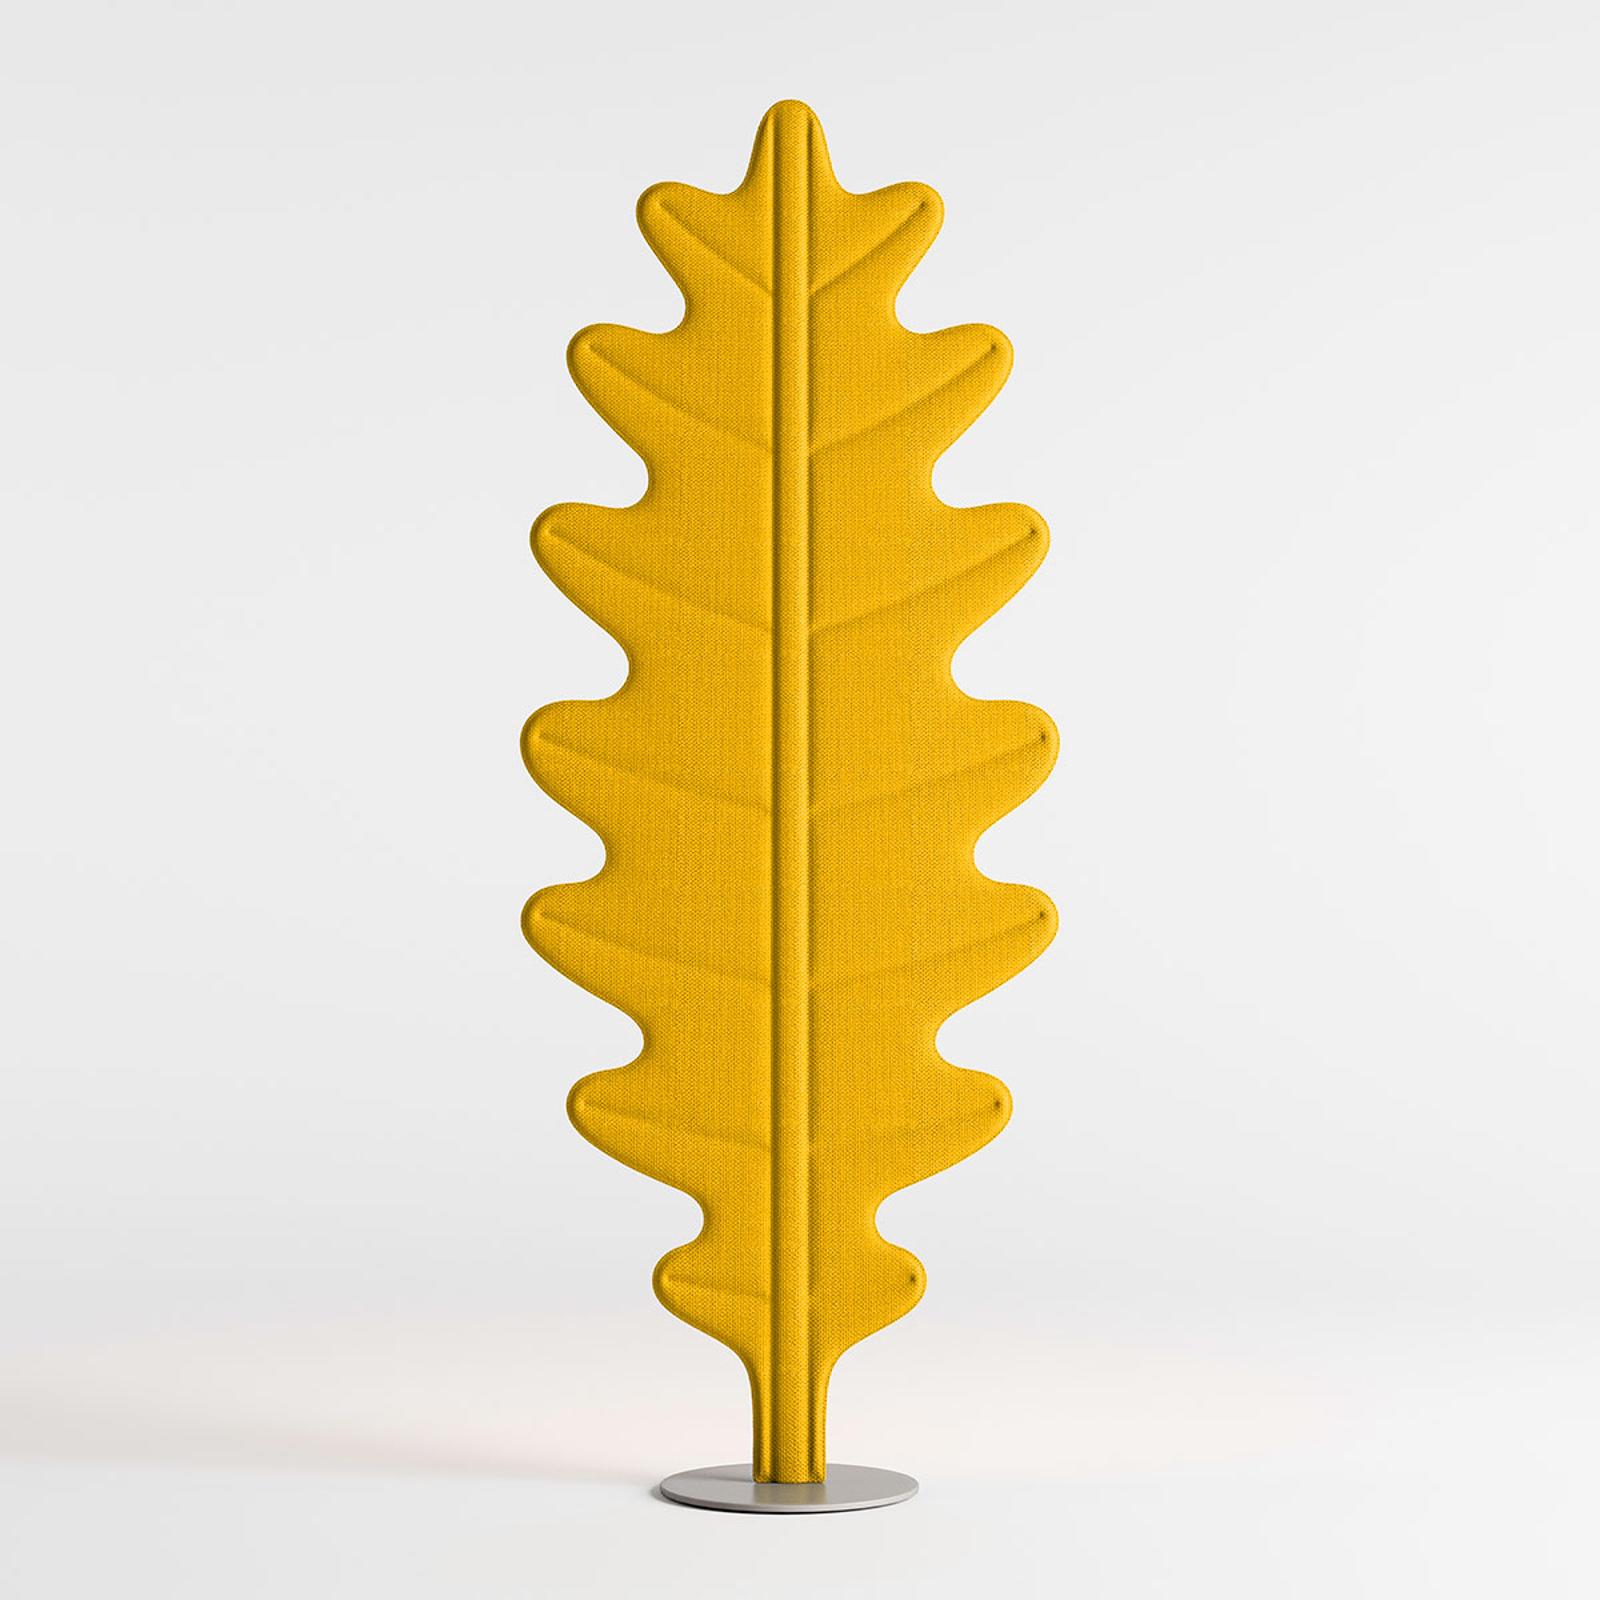 Rotaliana Eden Oak LED-Stehleuchte, gelb